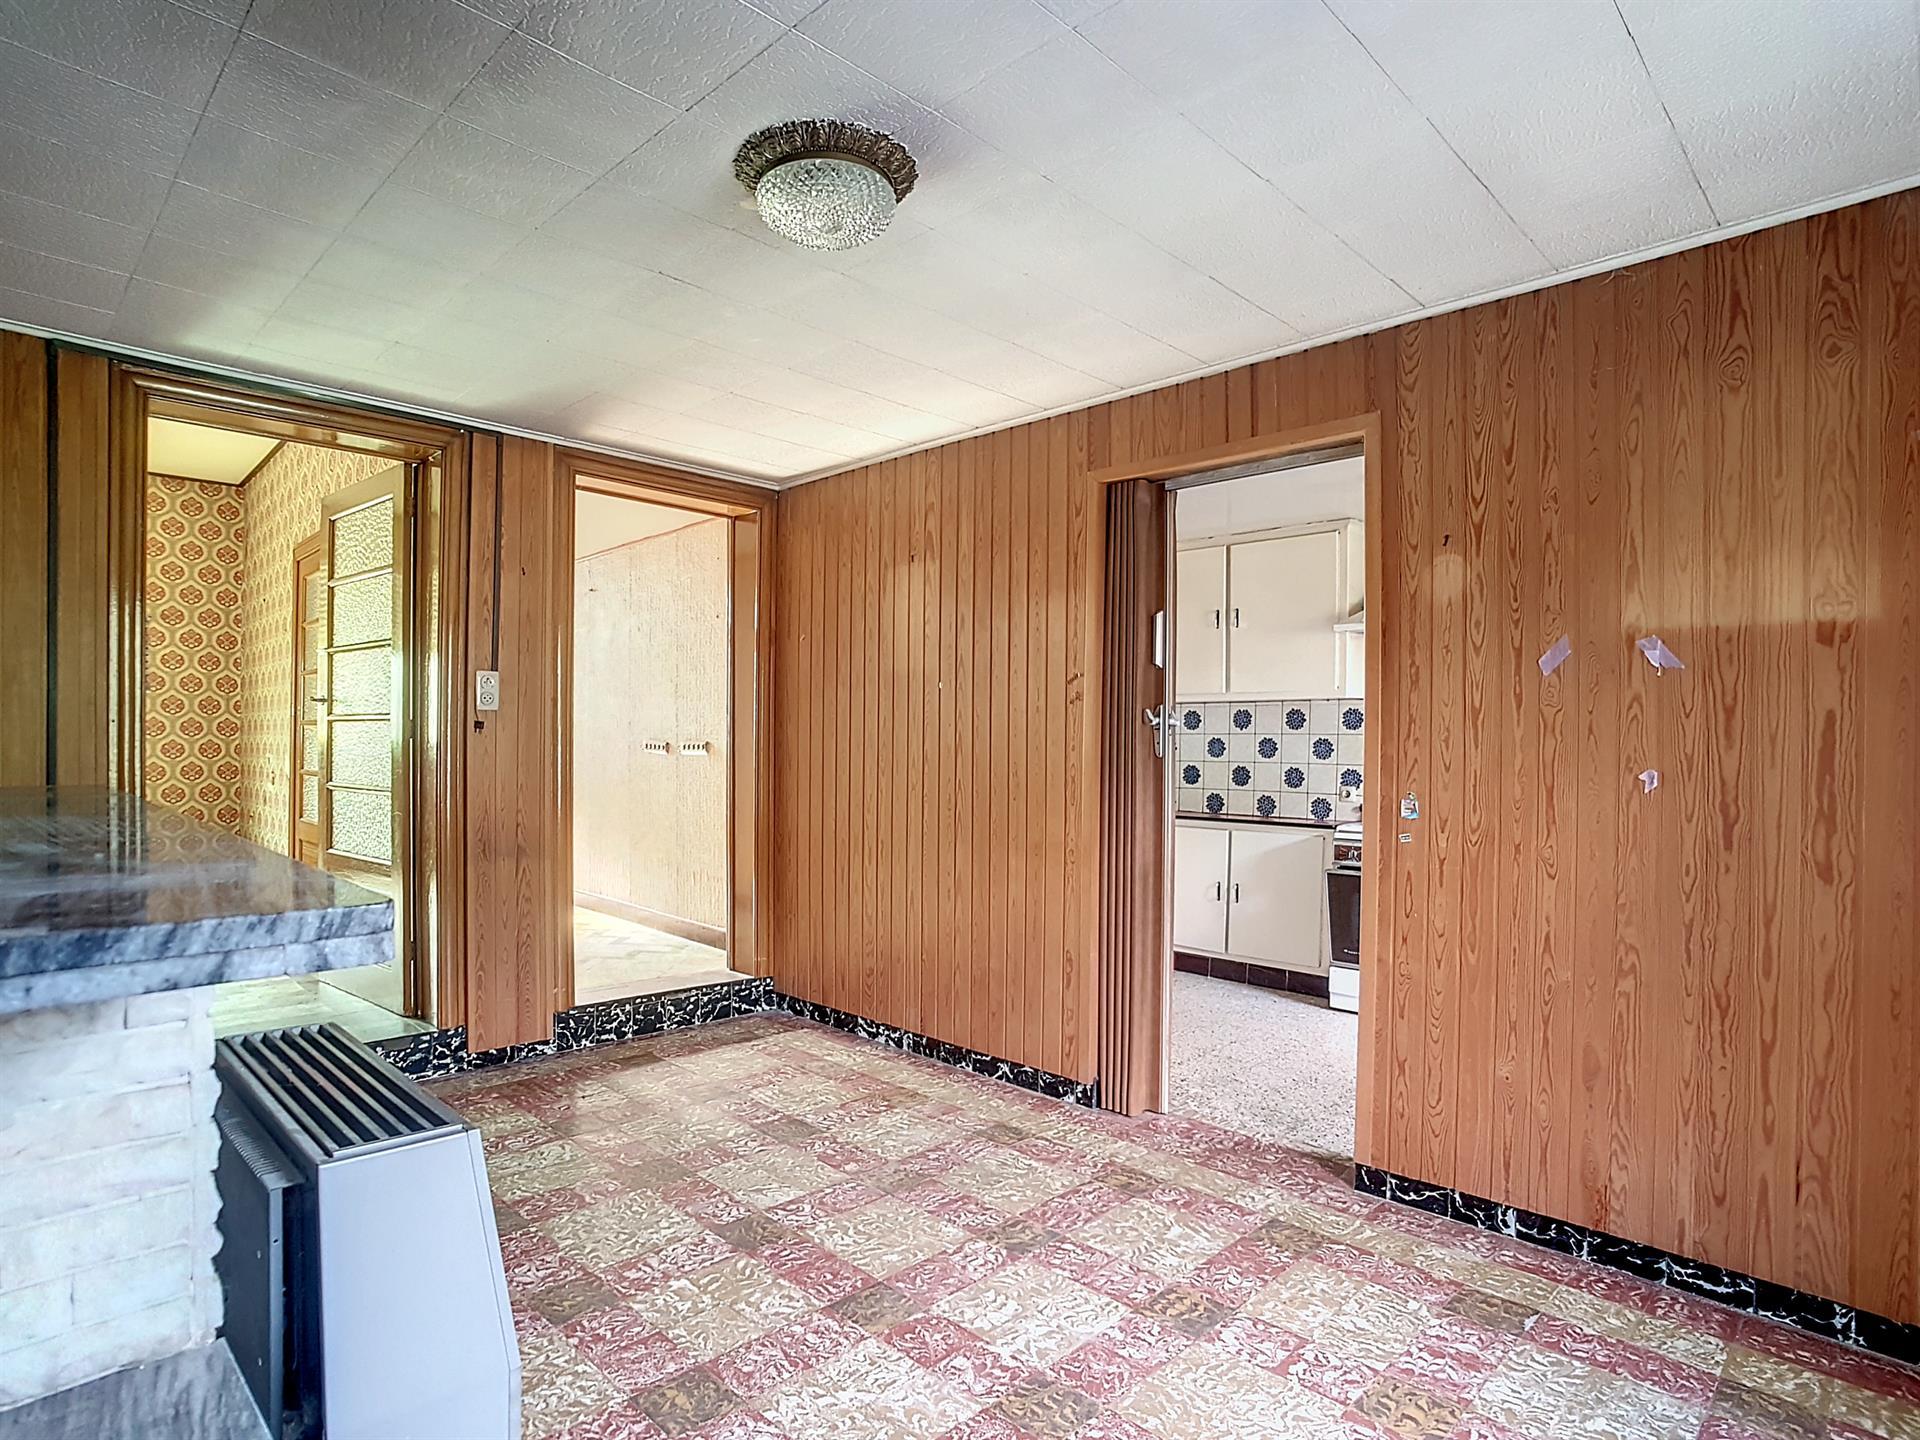 Maison - Zaventem Sterrebeek - #4507431-12